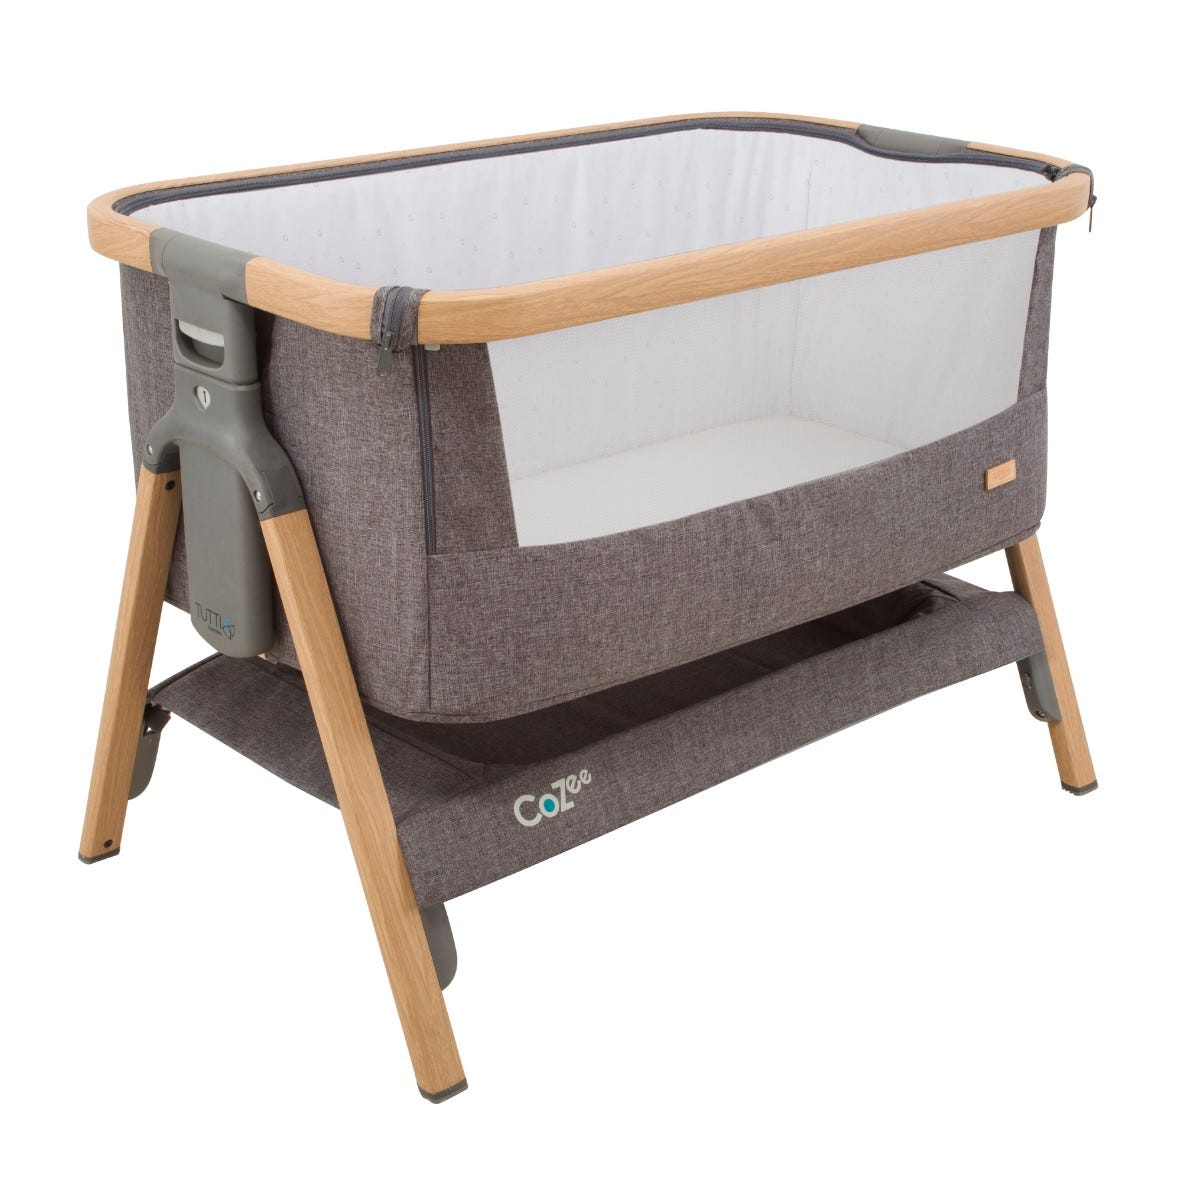 Tutti Bambini CoZee Fold Out Bedside Crib Oak and Charcoal